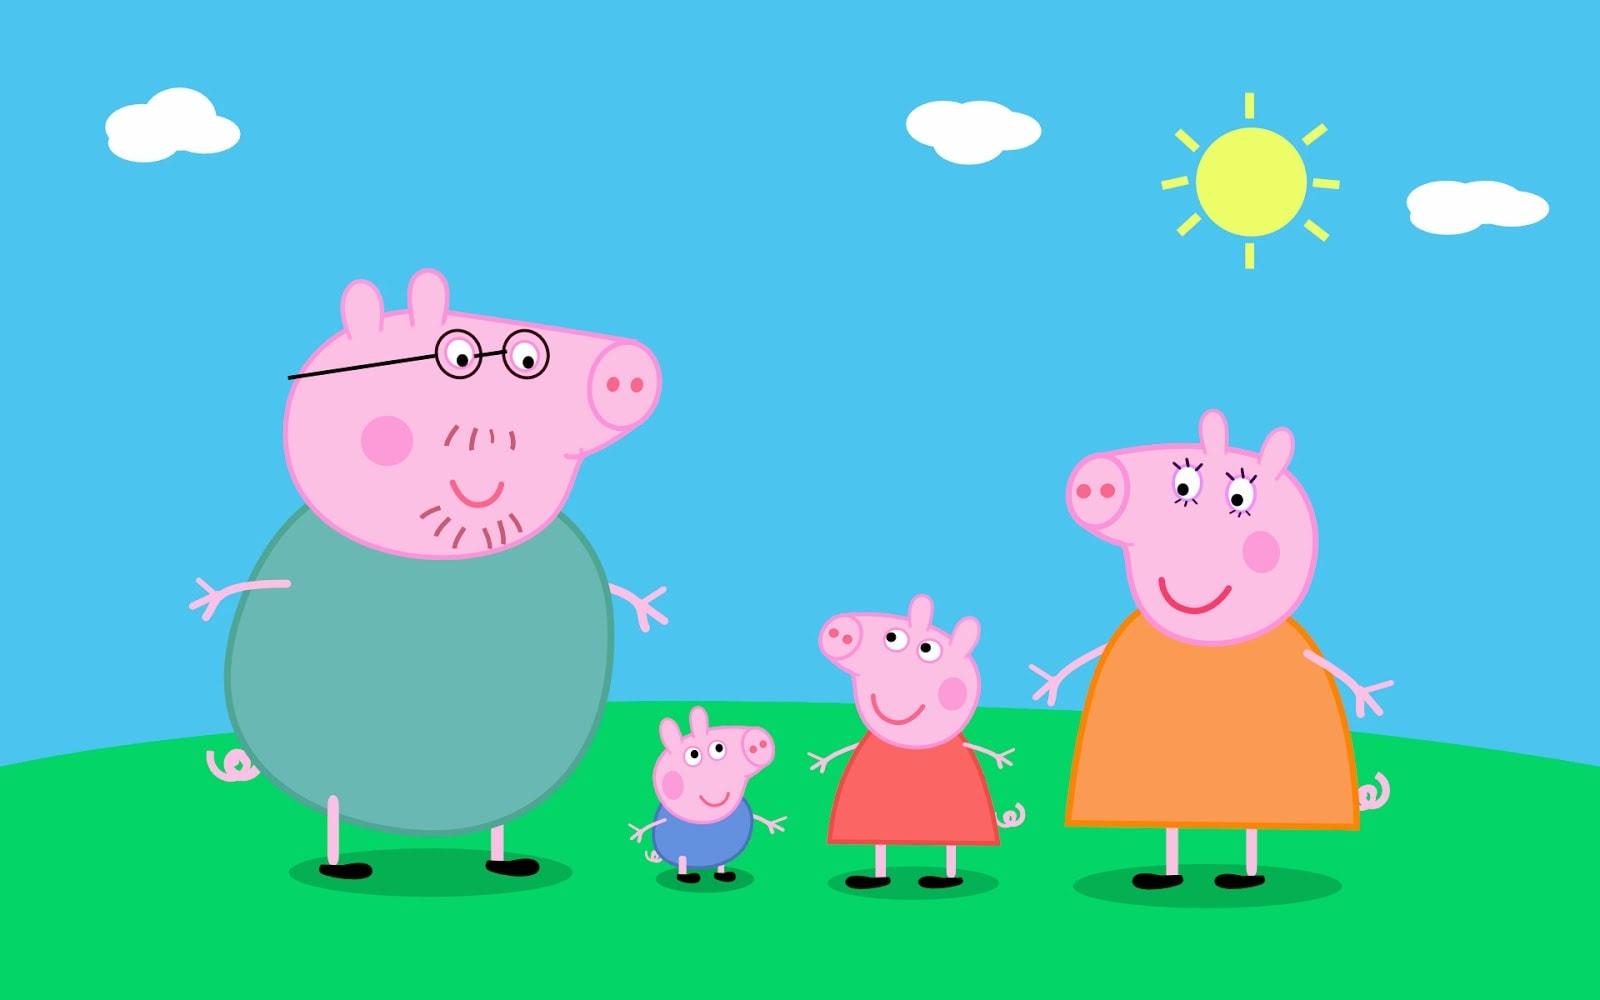 Свинка пеппа картинки разные